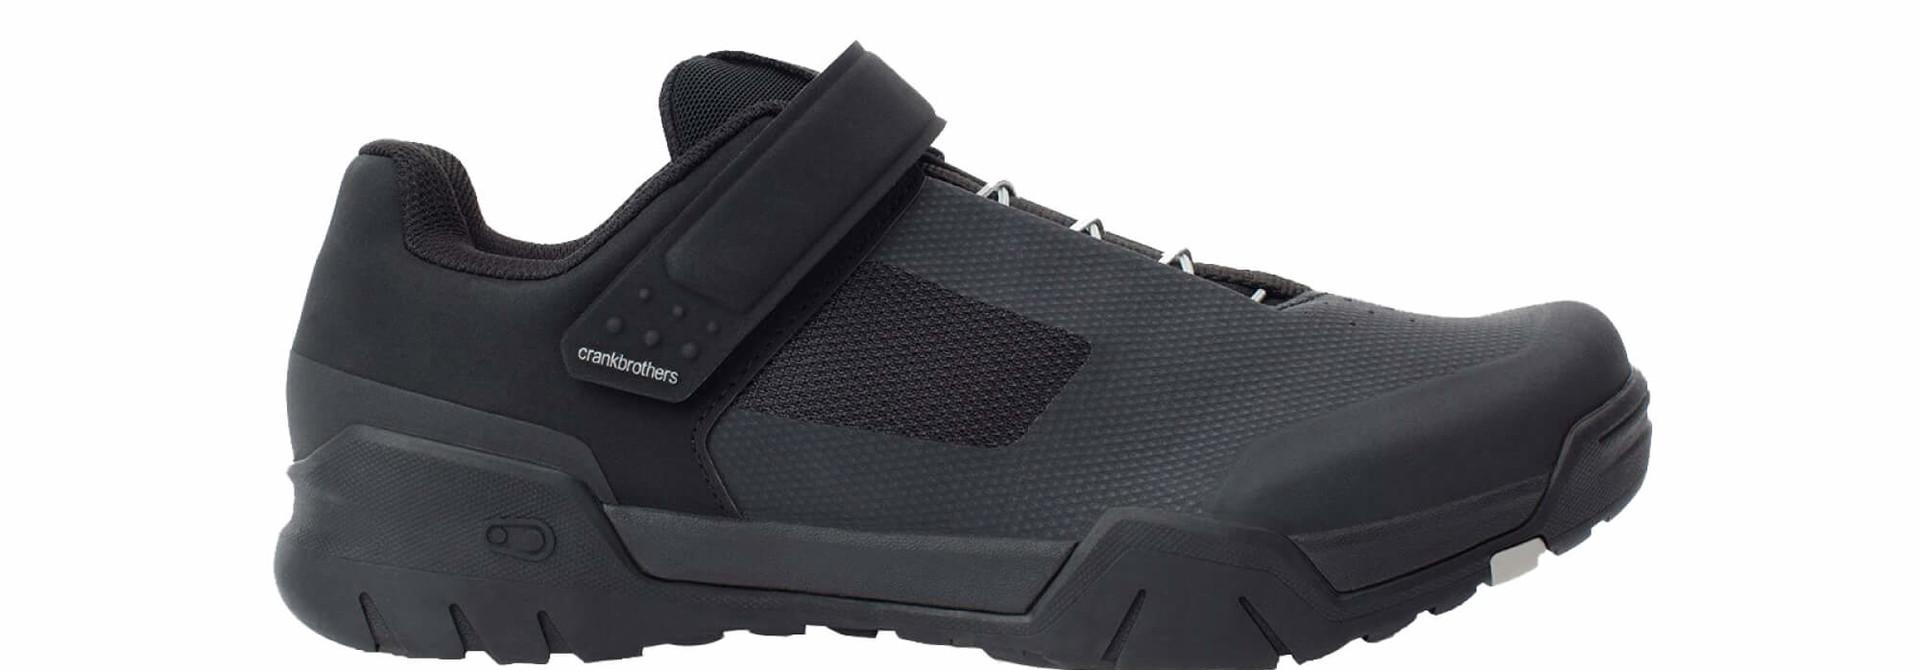 Shoes Mallet Speedlace Clipless Spd